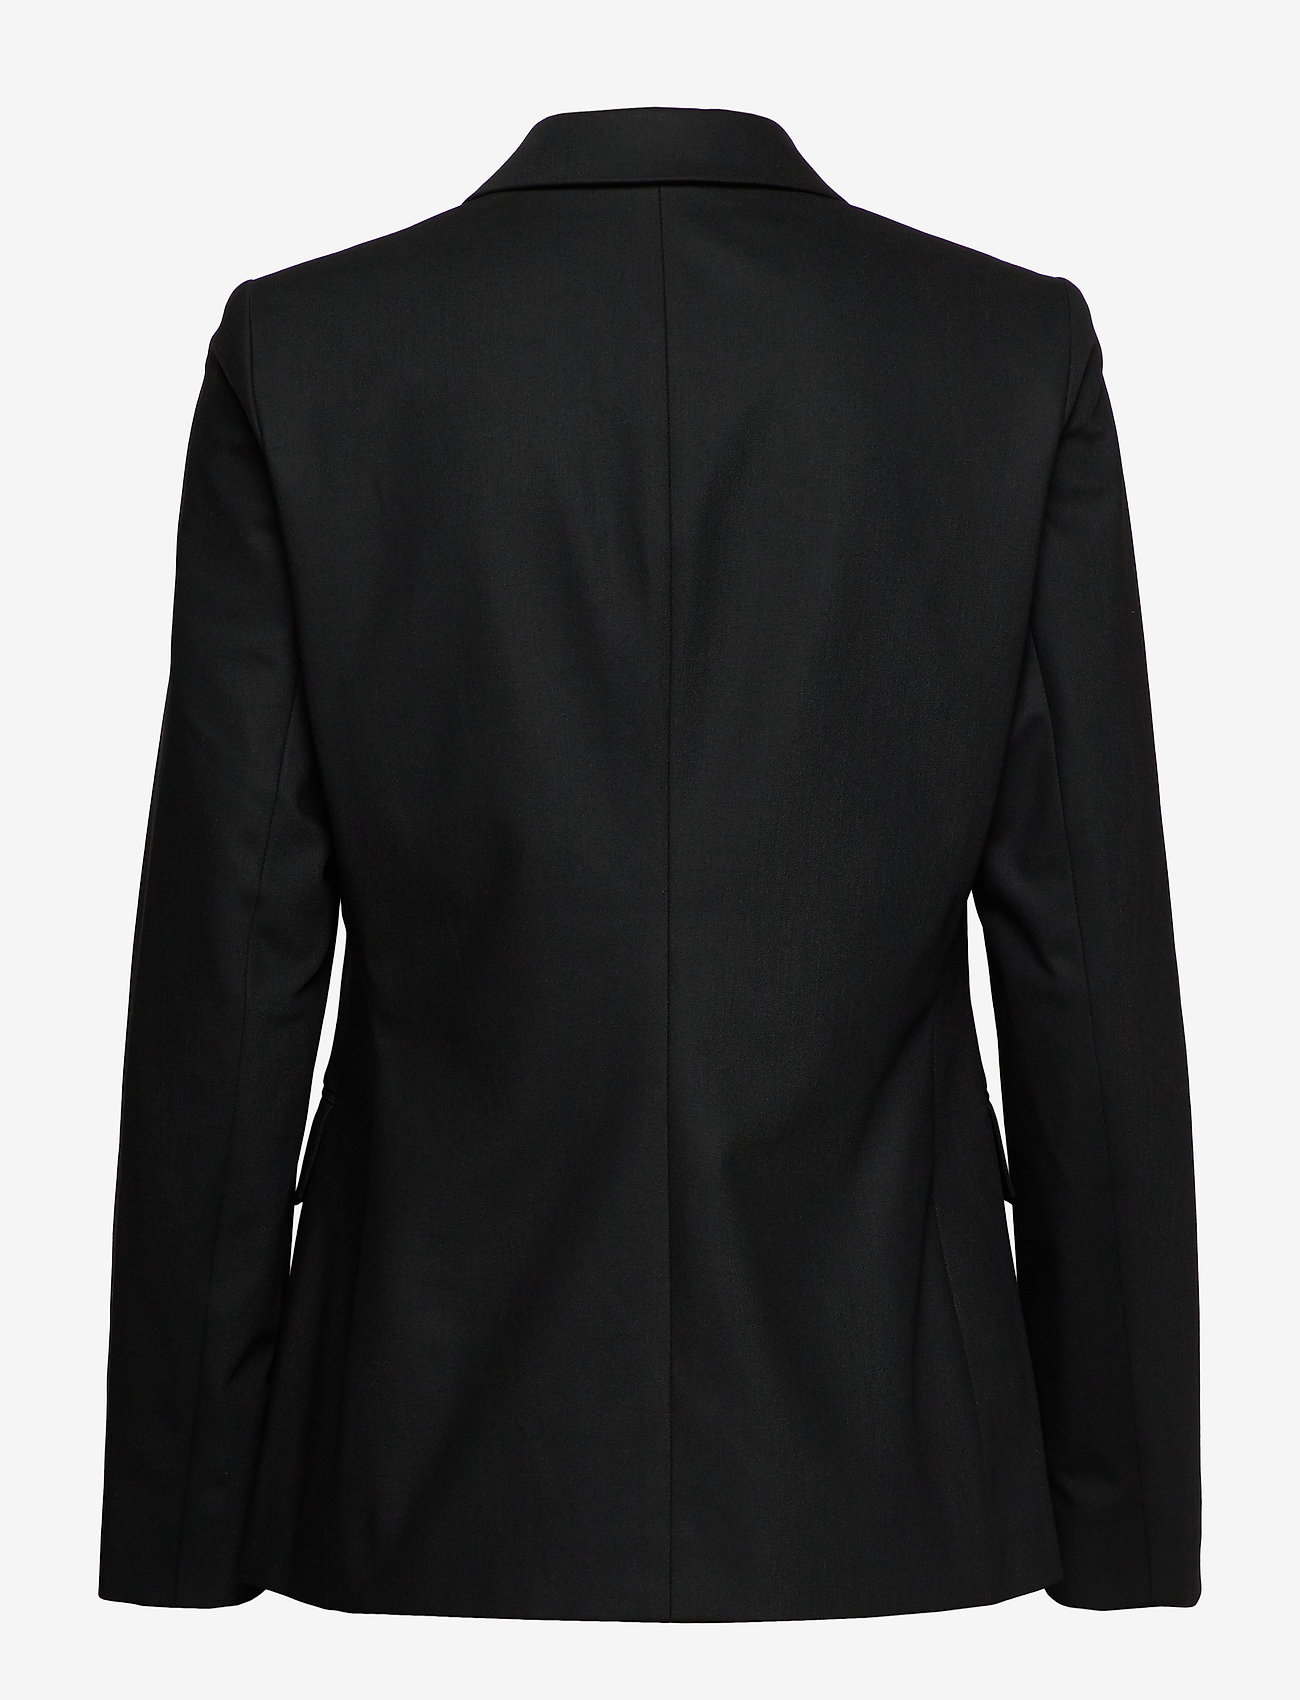 2nd Ross (Black) (155 €) - 2NDDAY D2mtU